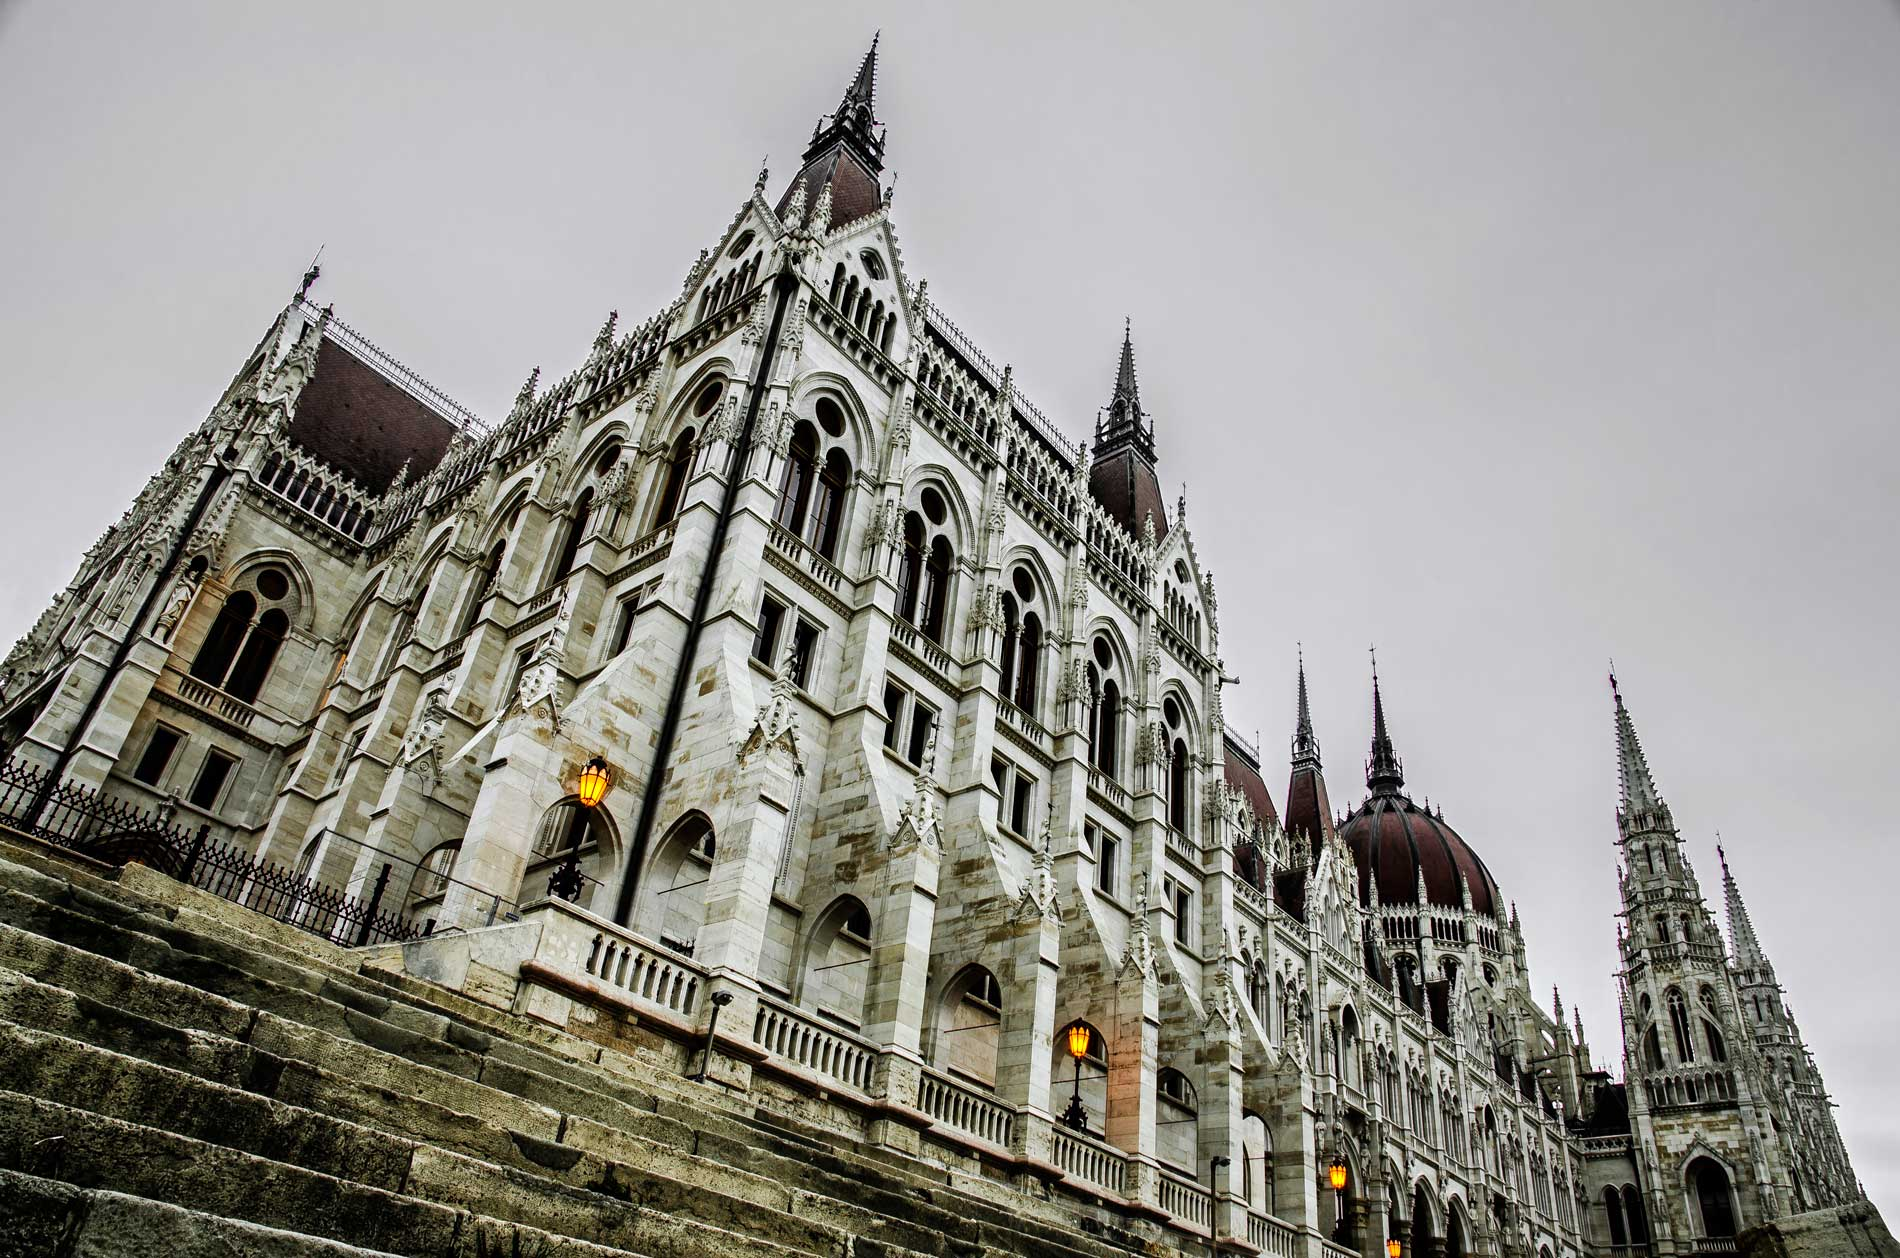 photography_atthary_budapest_monumental_10